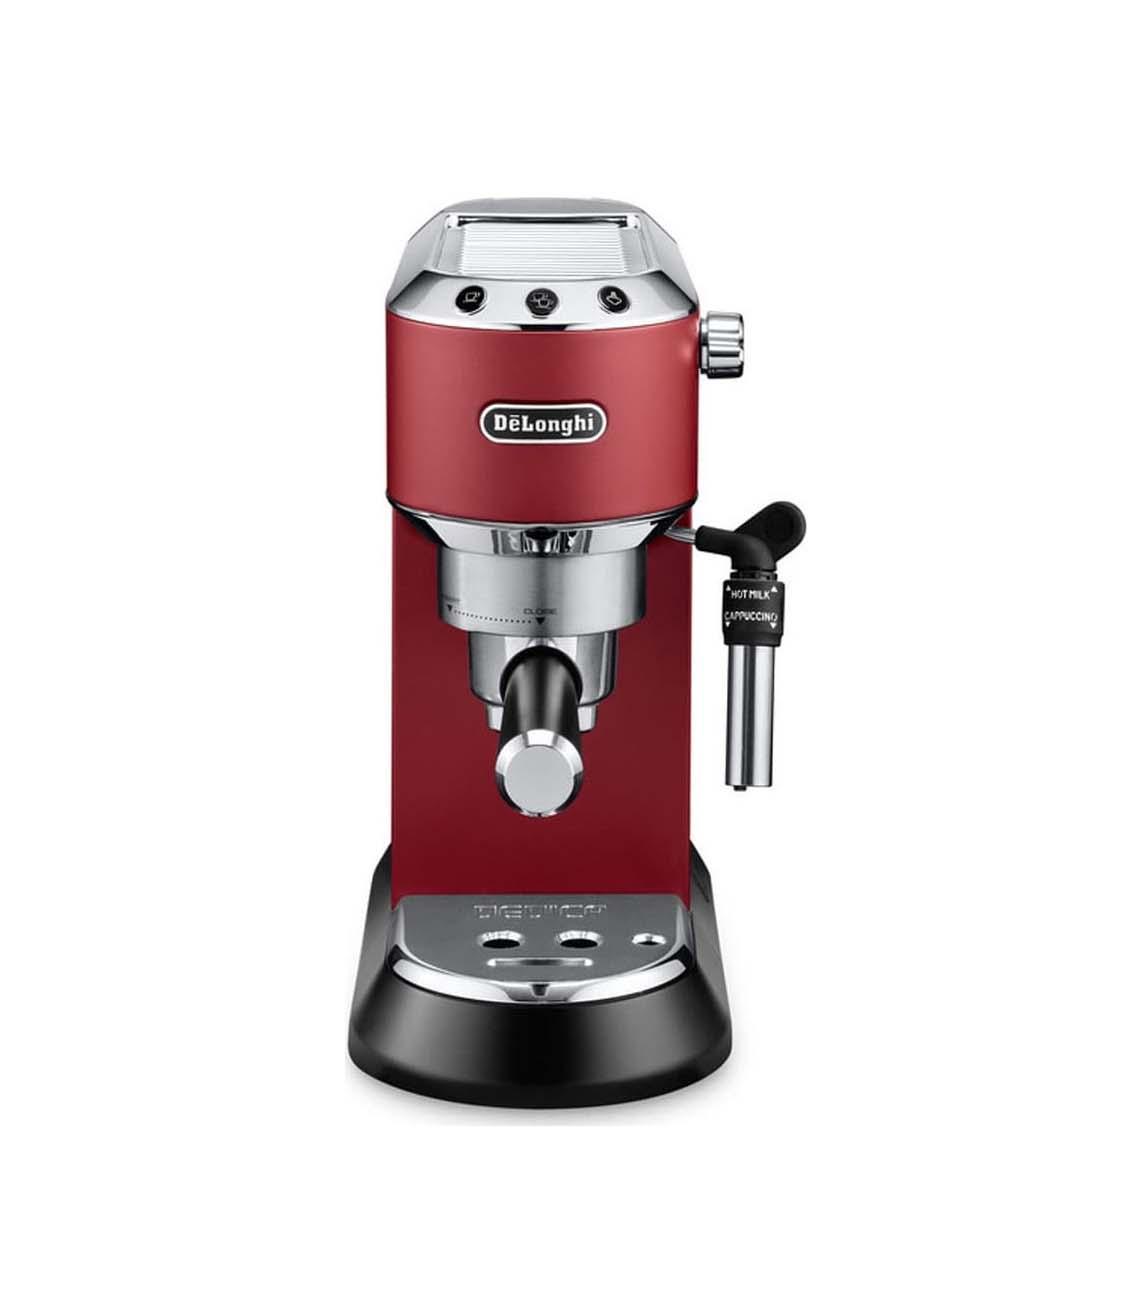 Delonghi EC 685 R Dedica Style Μηχανή Espresso Πληρωμή έως 24 δόσεις